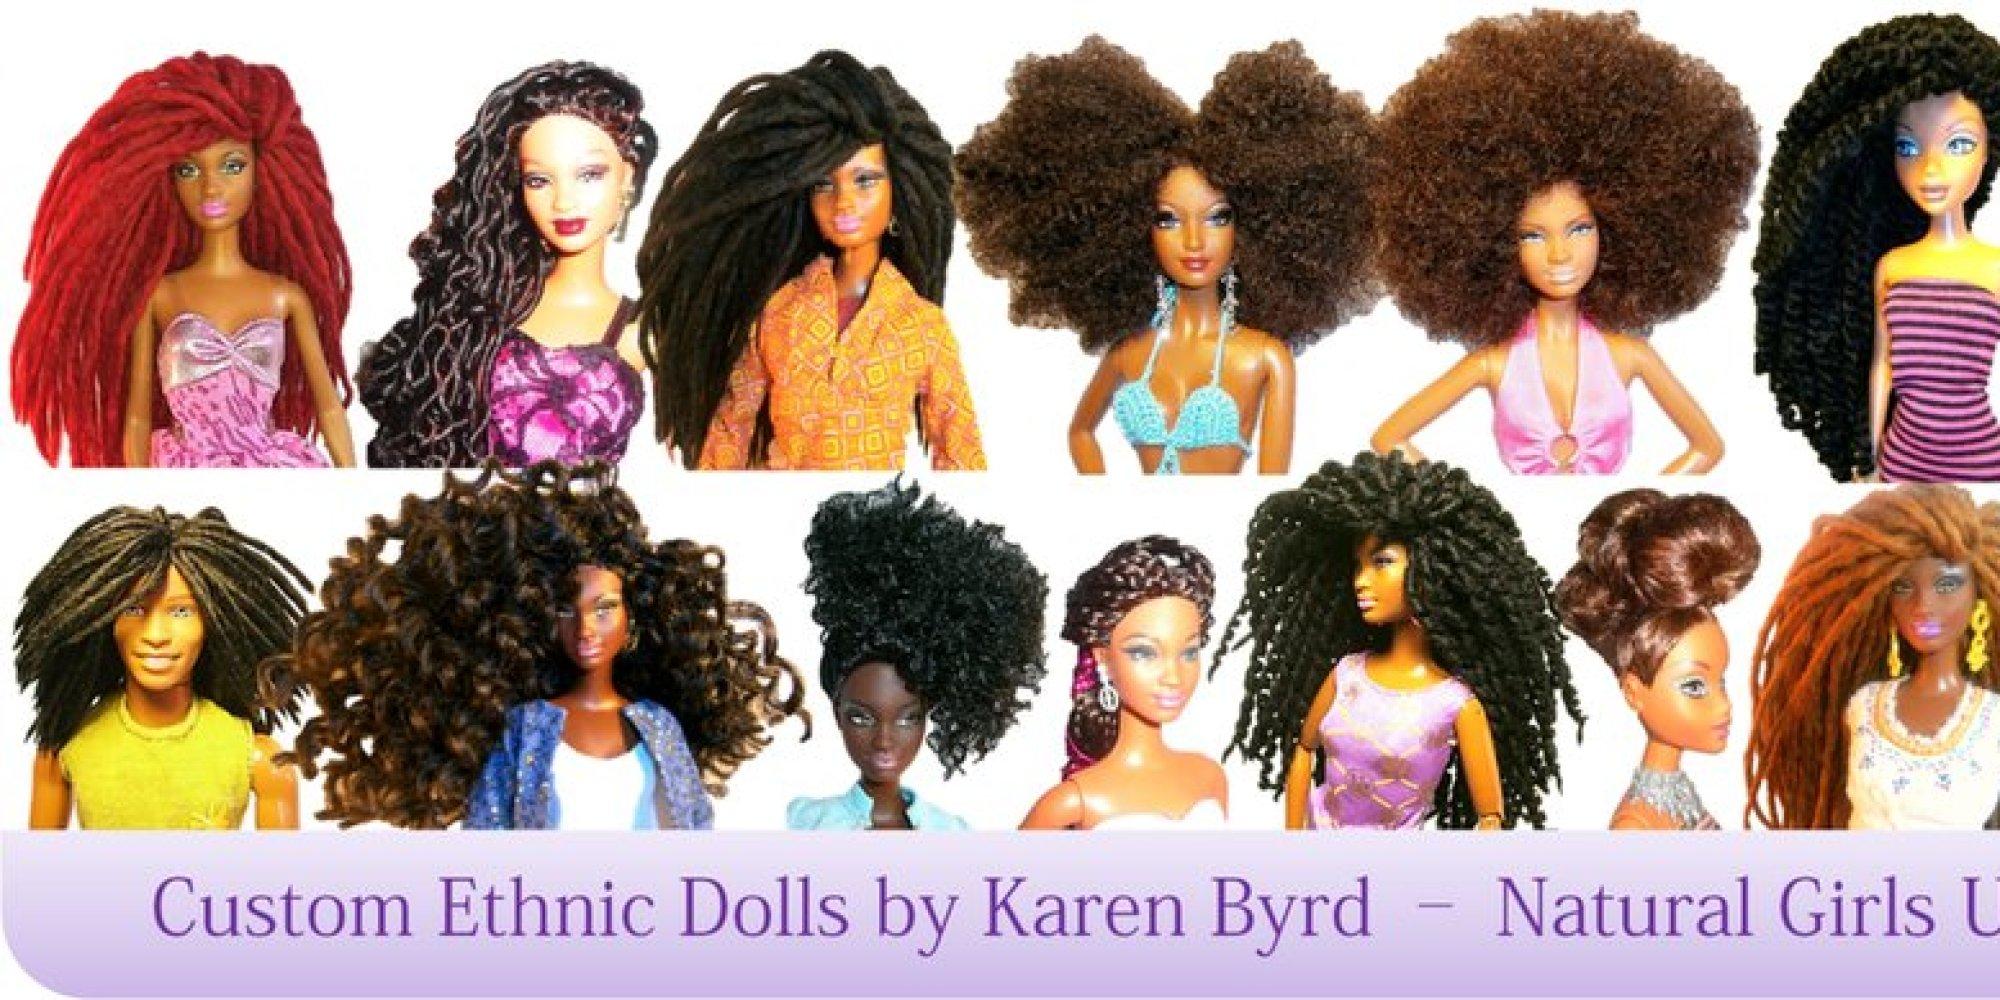 Prime Hairstyles For Dolls Baby Dolls Ideas Short Hairstyles For Black Women Fulllsitofus